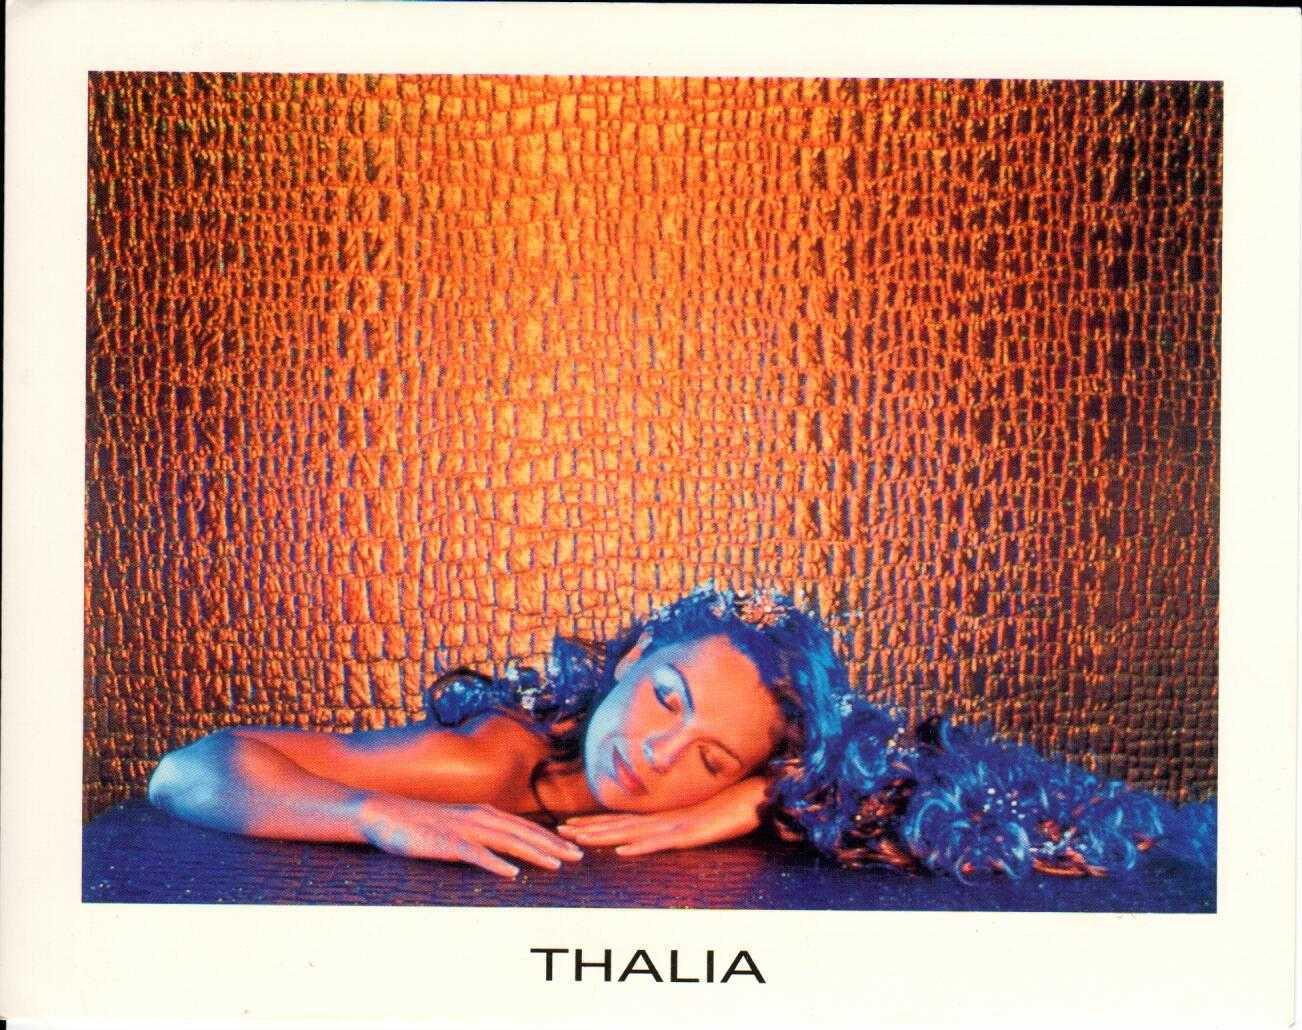 "THALIA Rosalinda 2000 US 7"" X 5"" Official Two Sided Postcard"